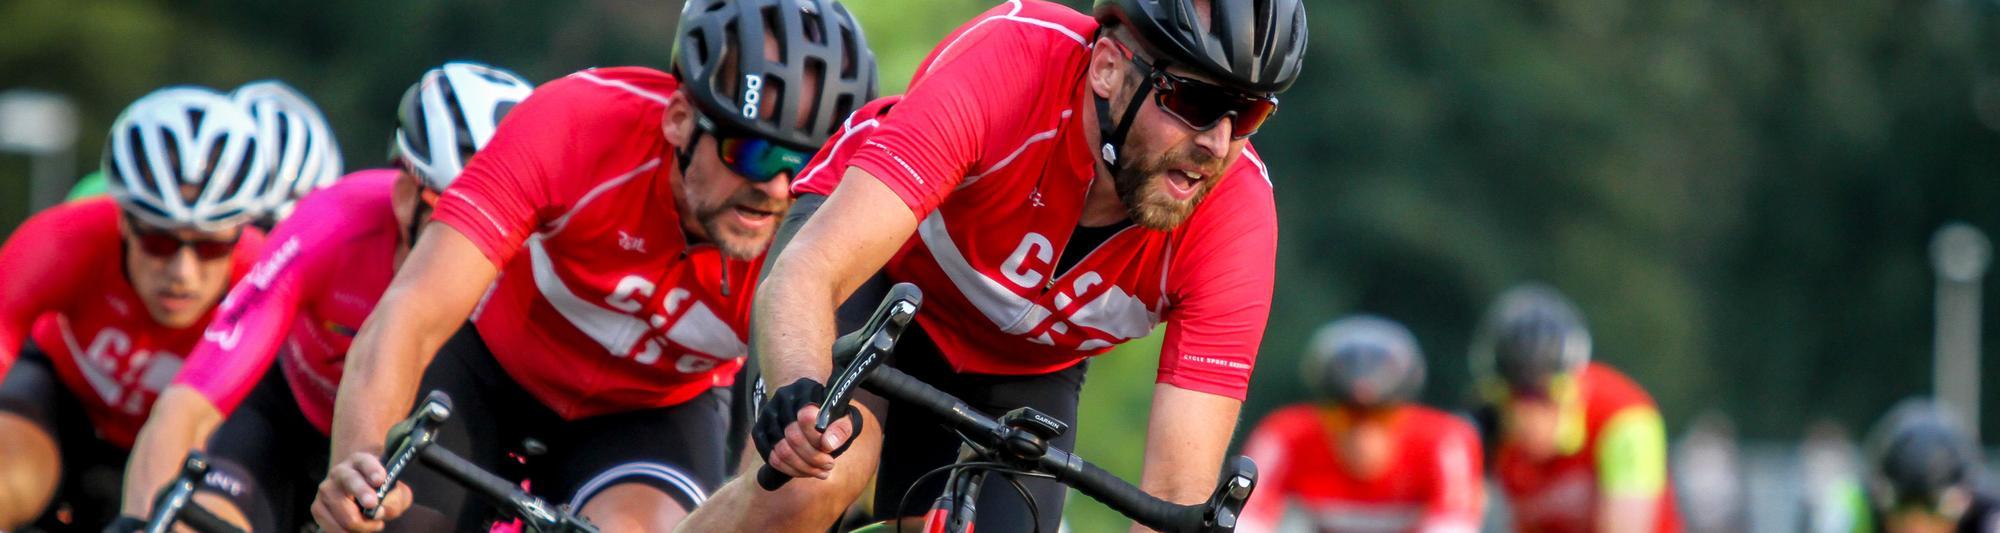 Cycle Sport Groningen